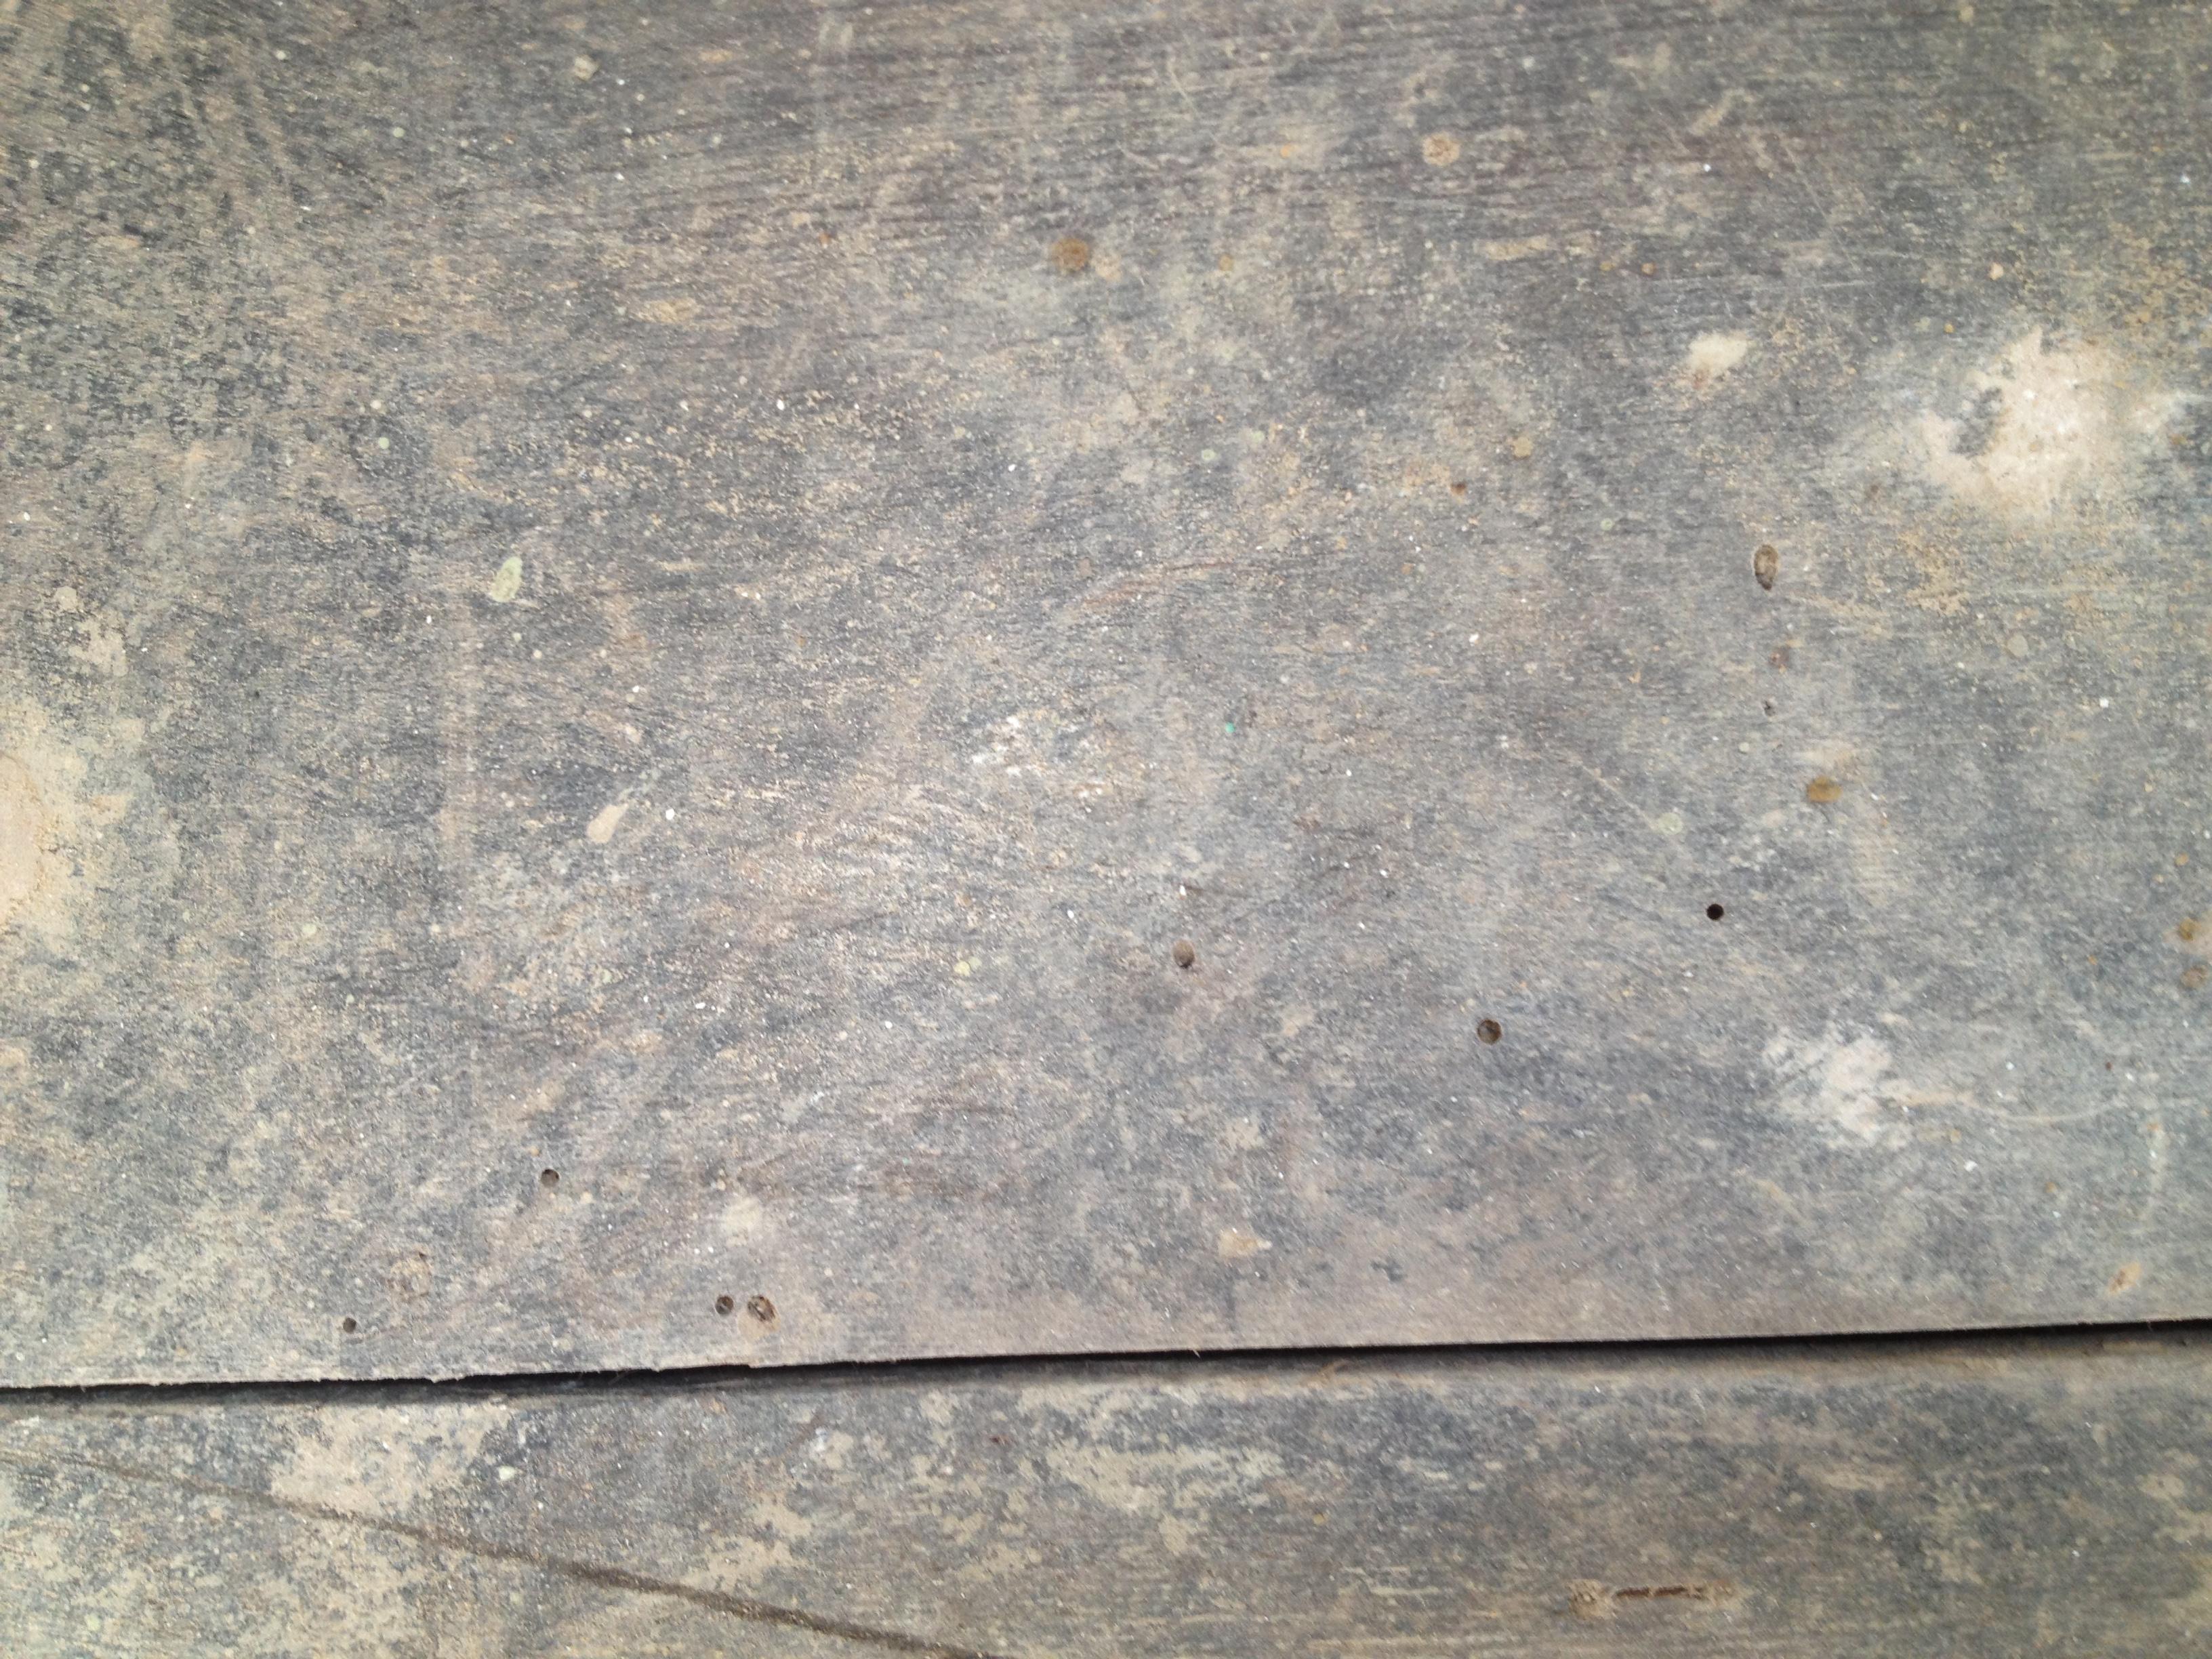 woodworm exit holes